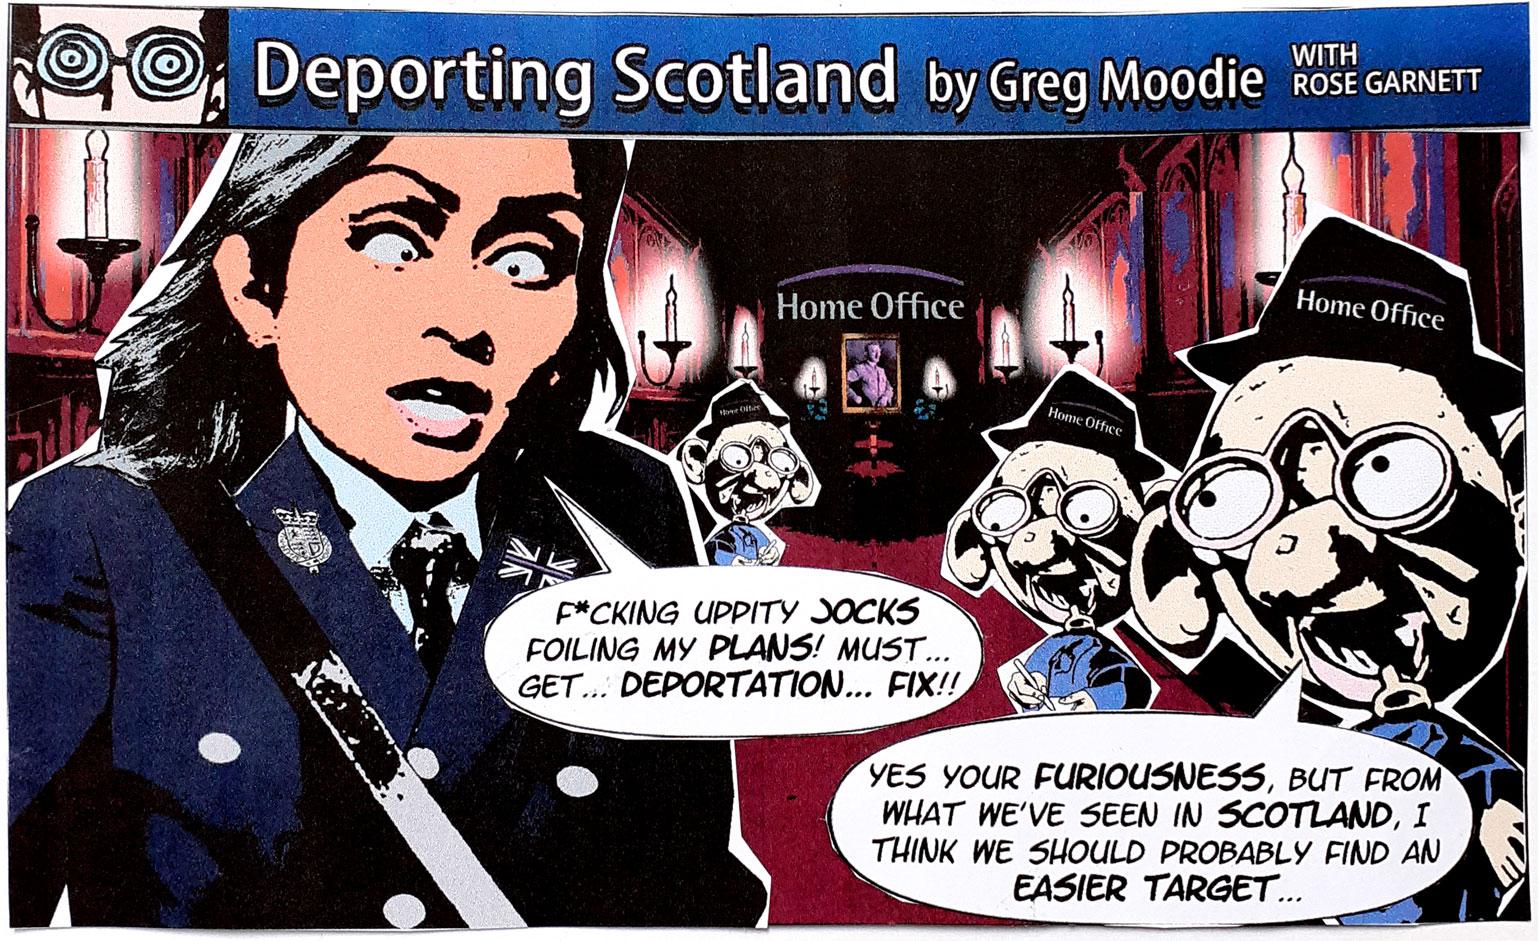 Deporting Scotland